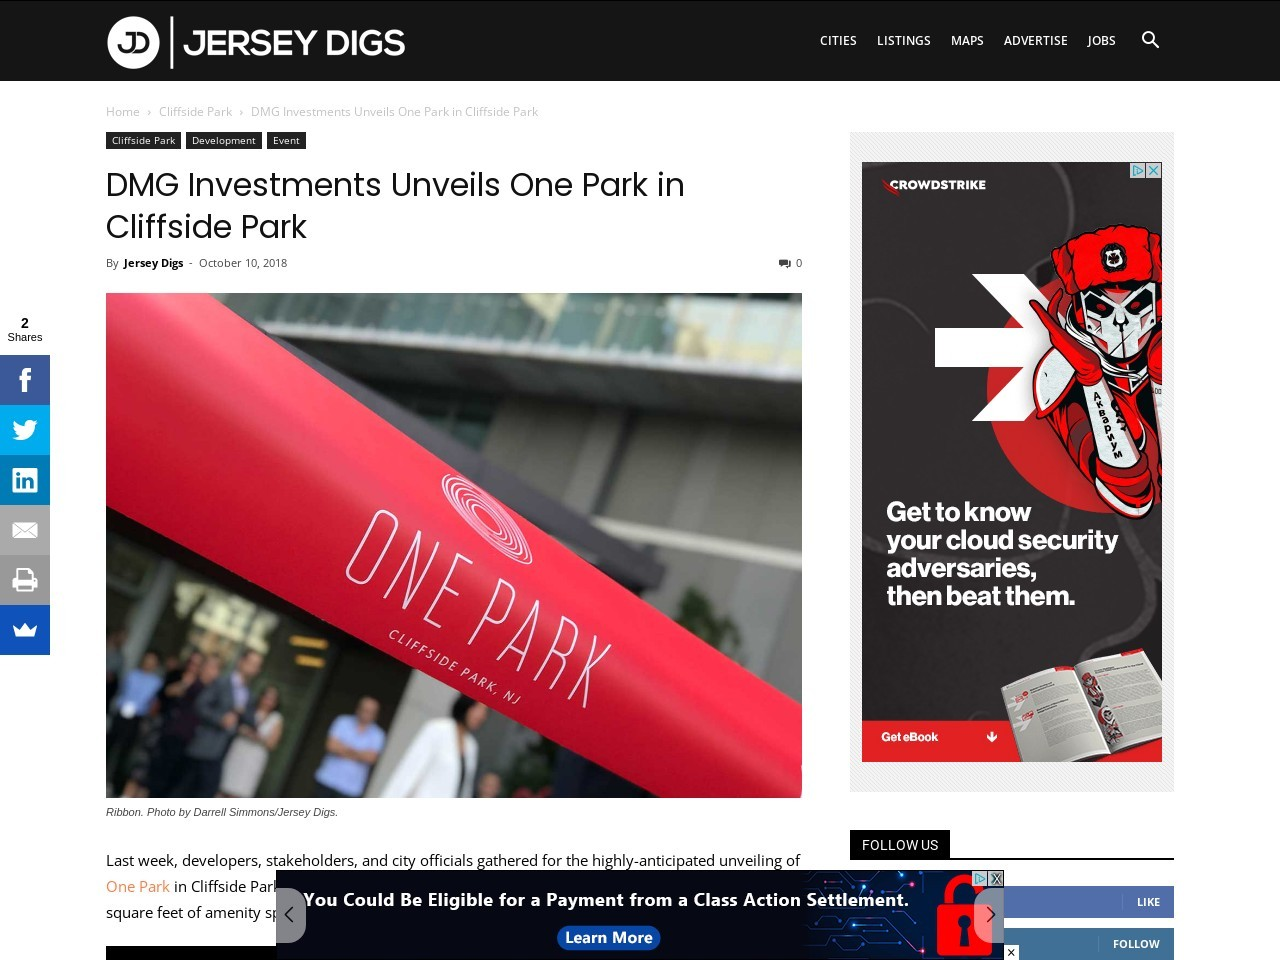 DMG Investments Unveils One Park in Cliffside Park